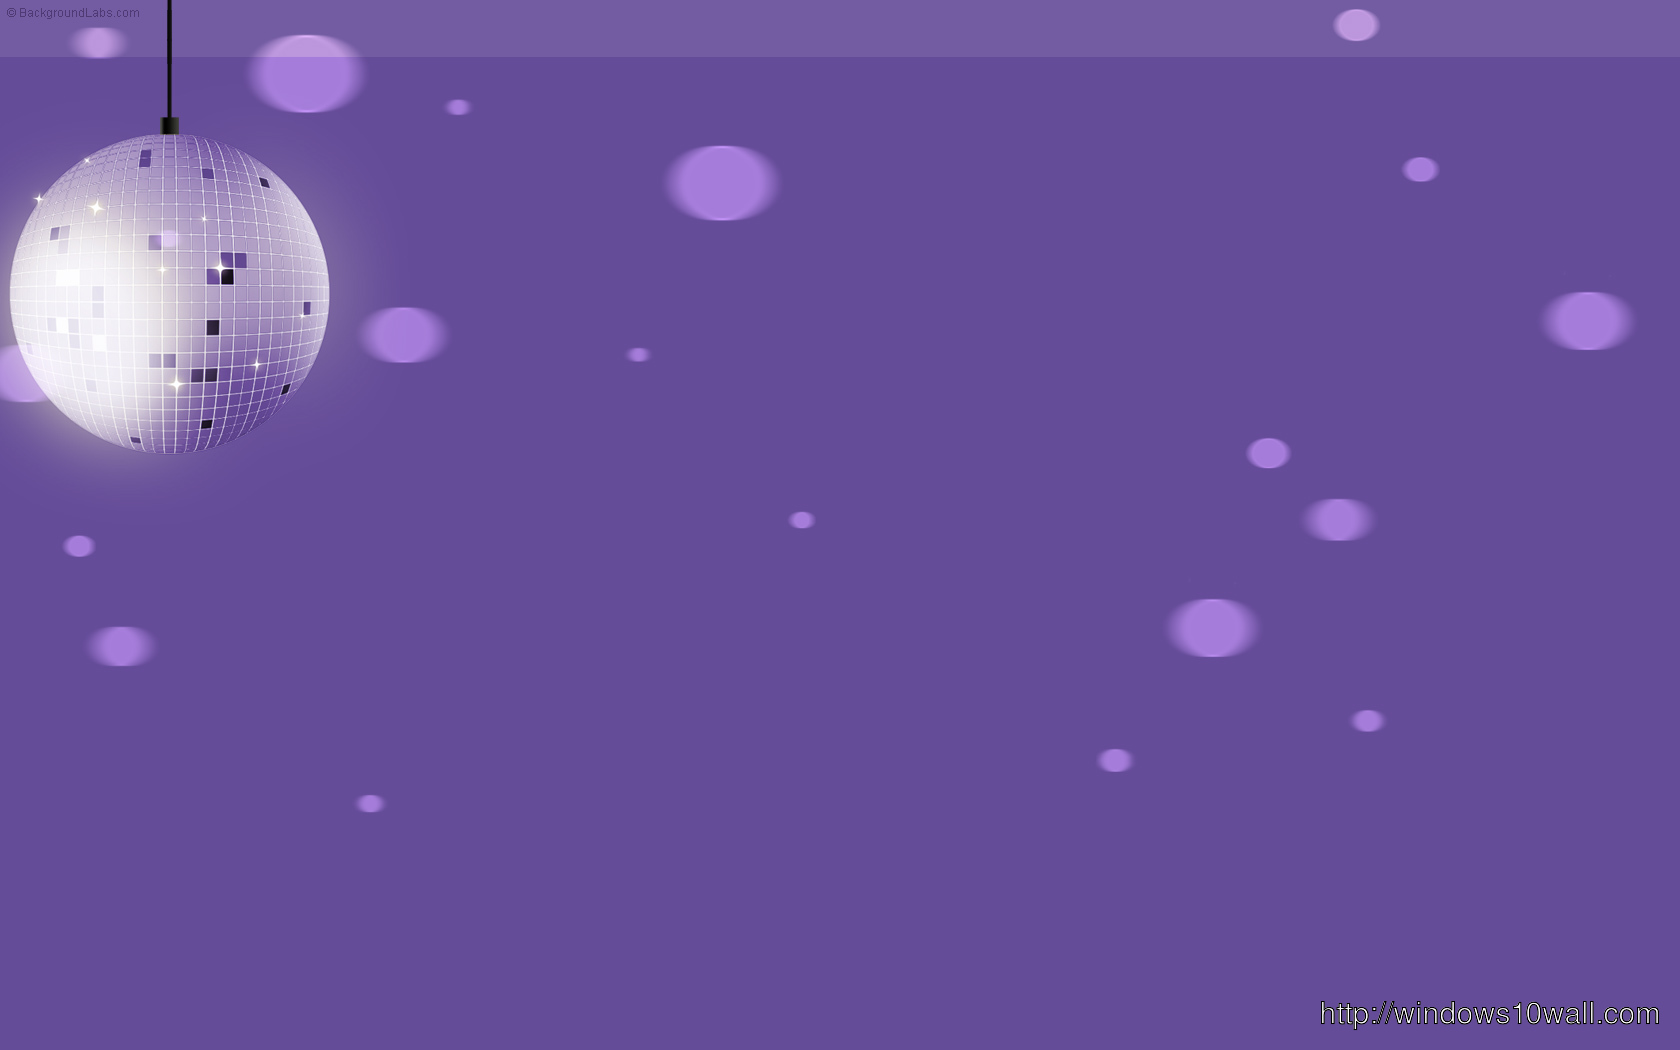 Disco Blue Twitter Background Wallpaper - windows 10 ...